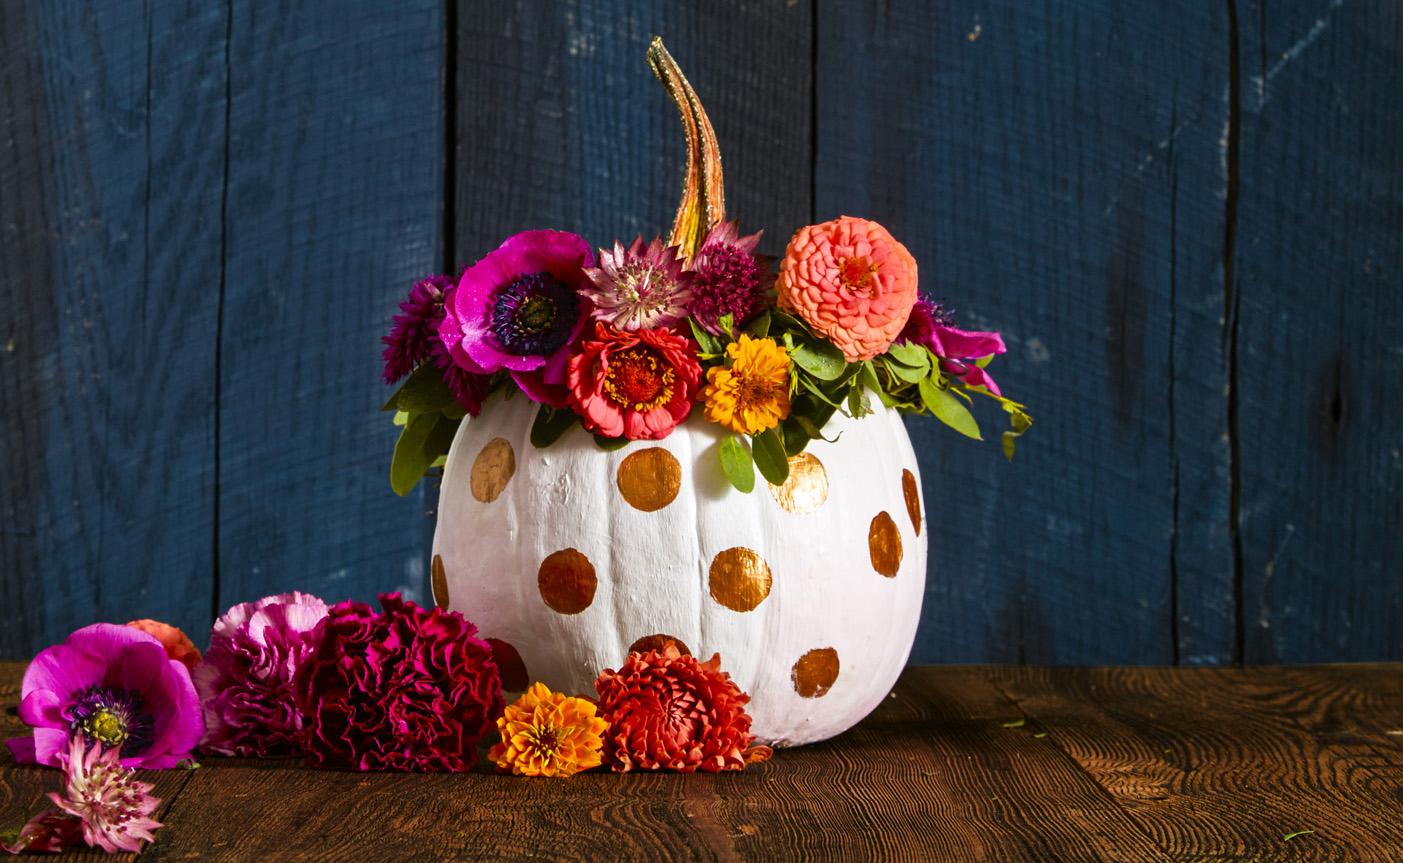 55 Pumpkin Designs We Love for 2017 - Pumpkin Decorating Ideas